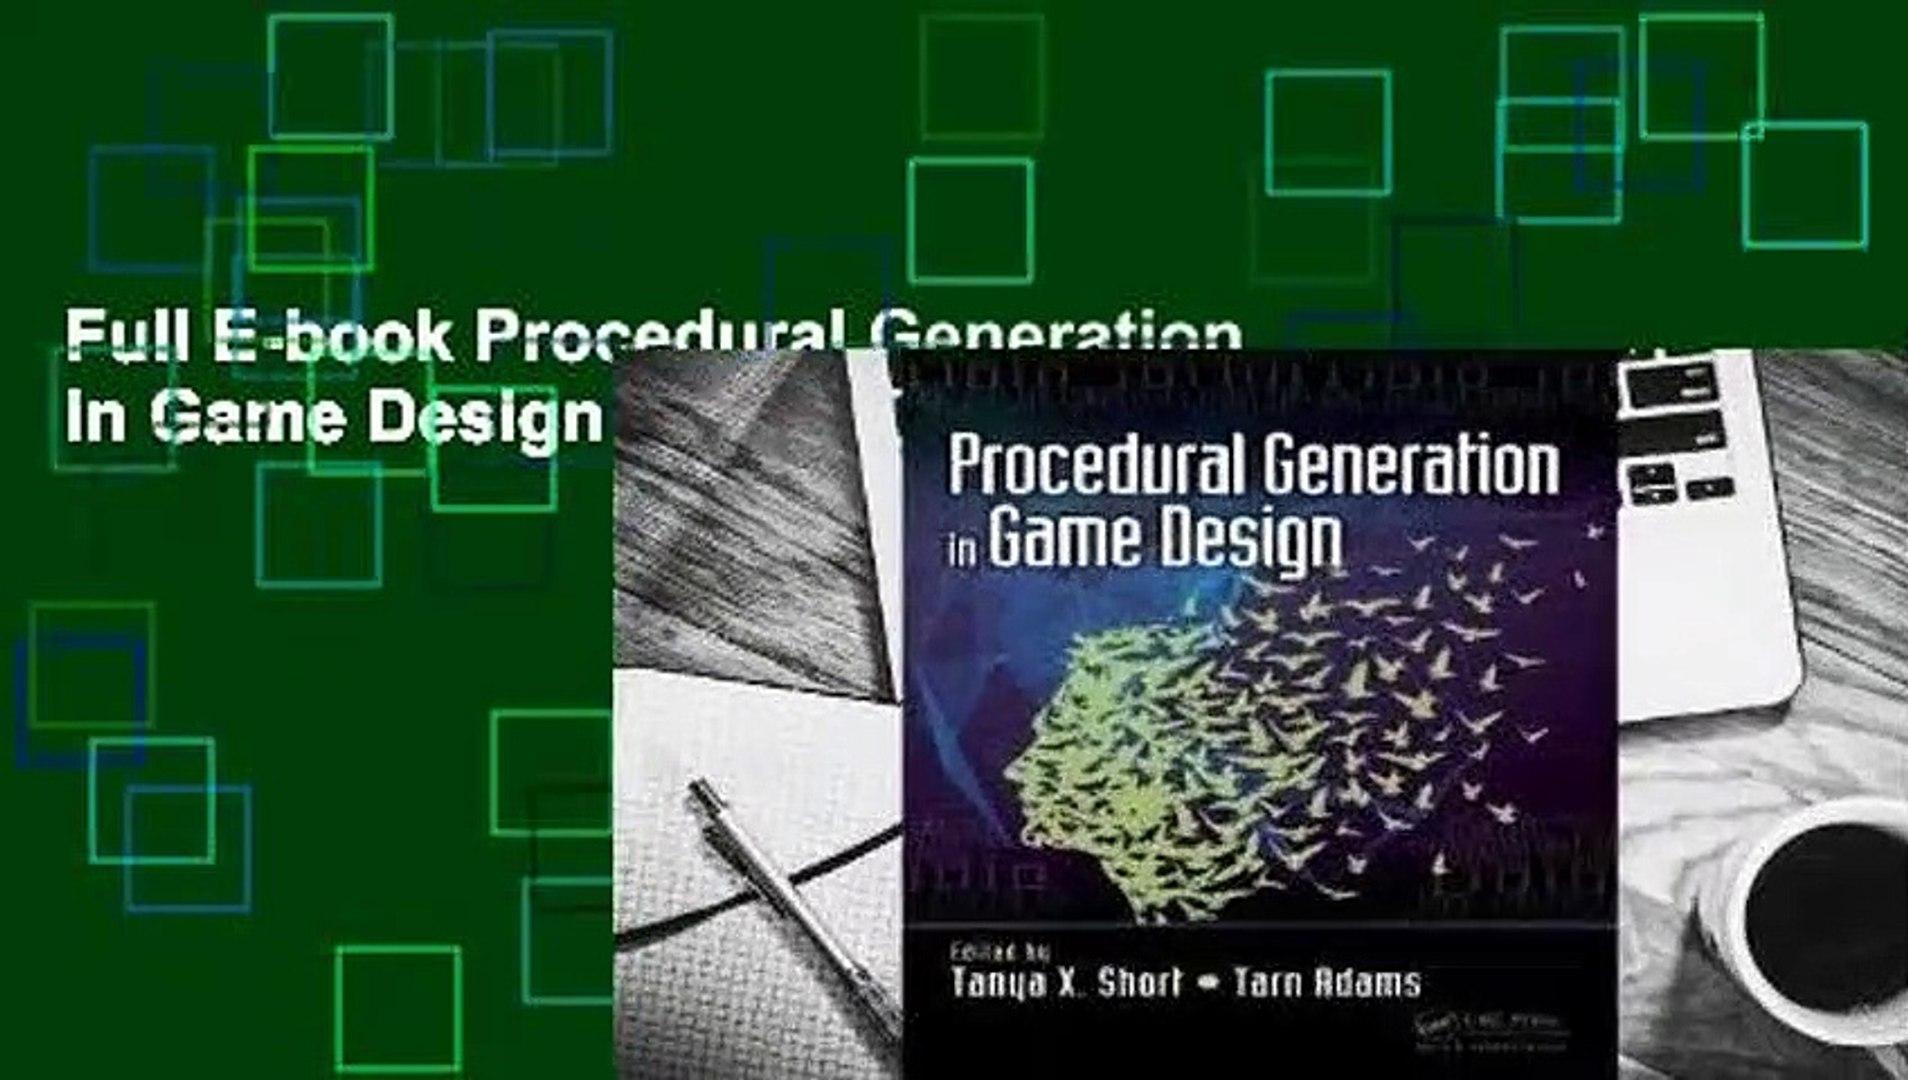 Full E-book Procedural Generation in Game Design For Free